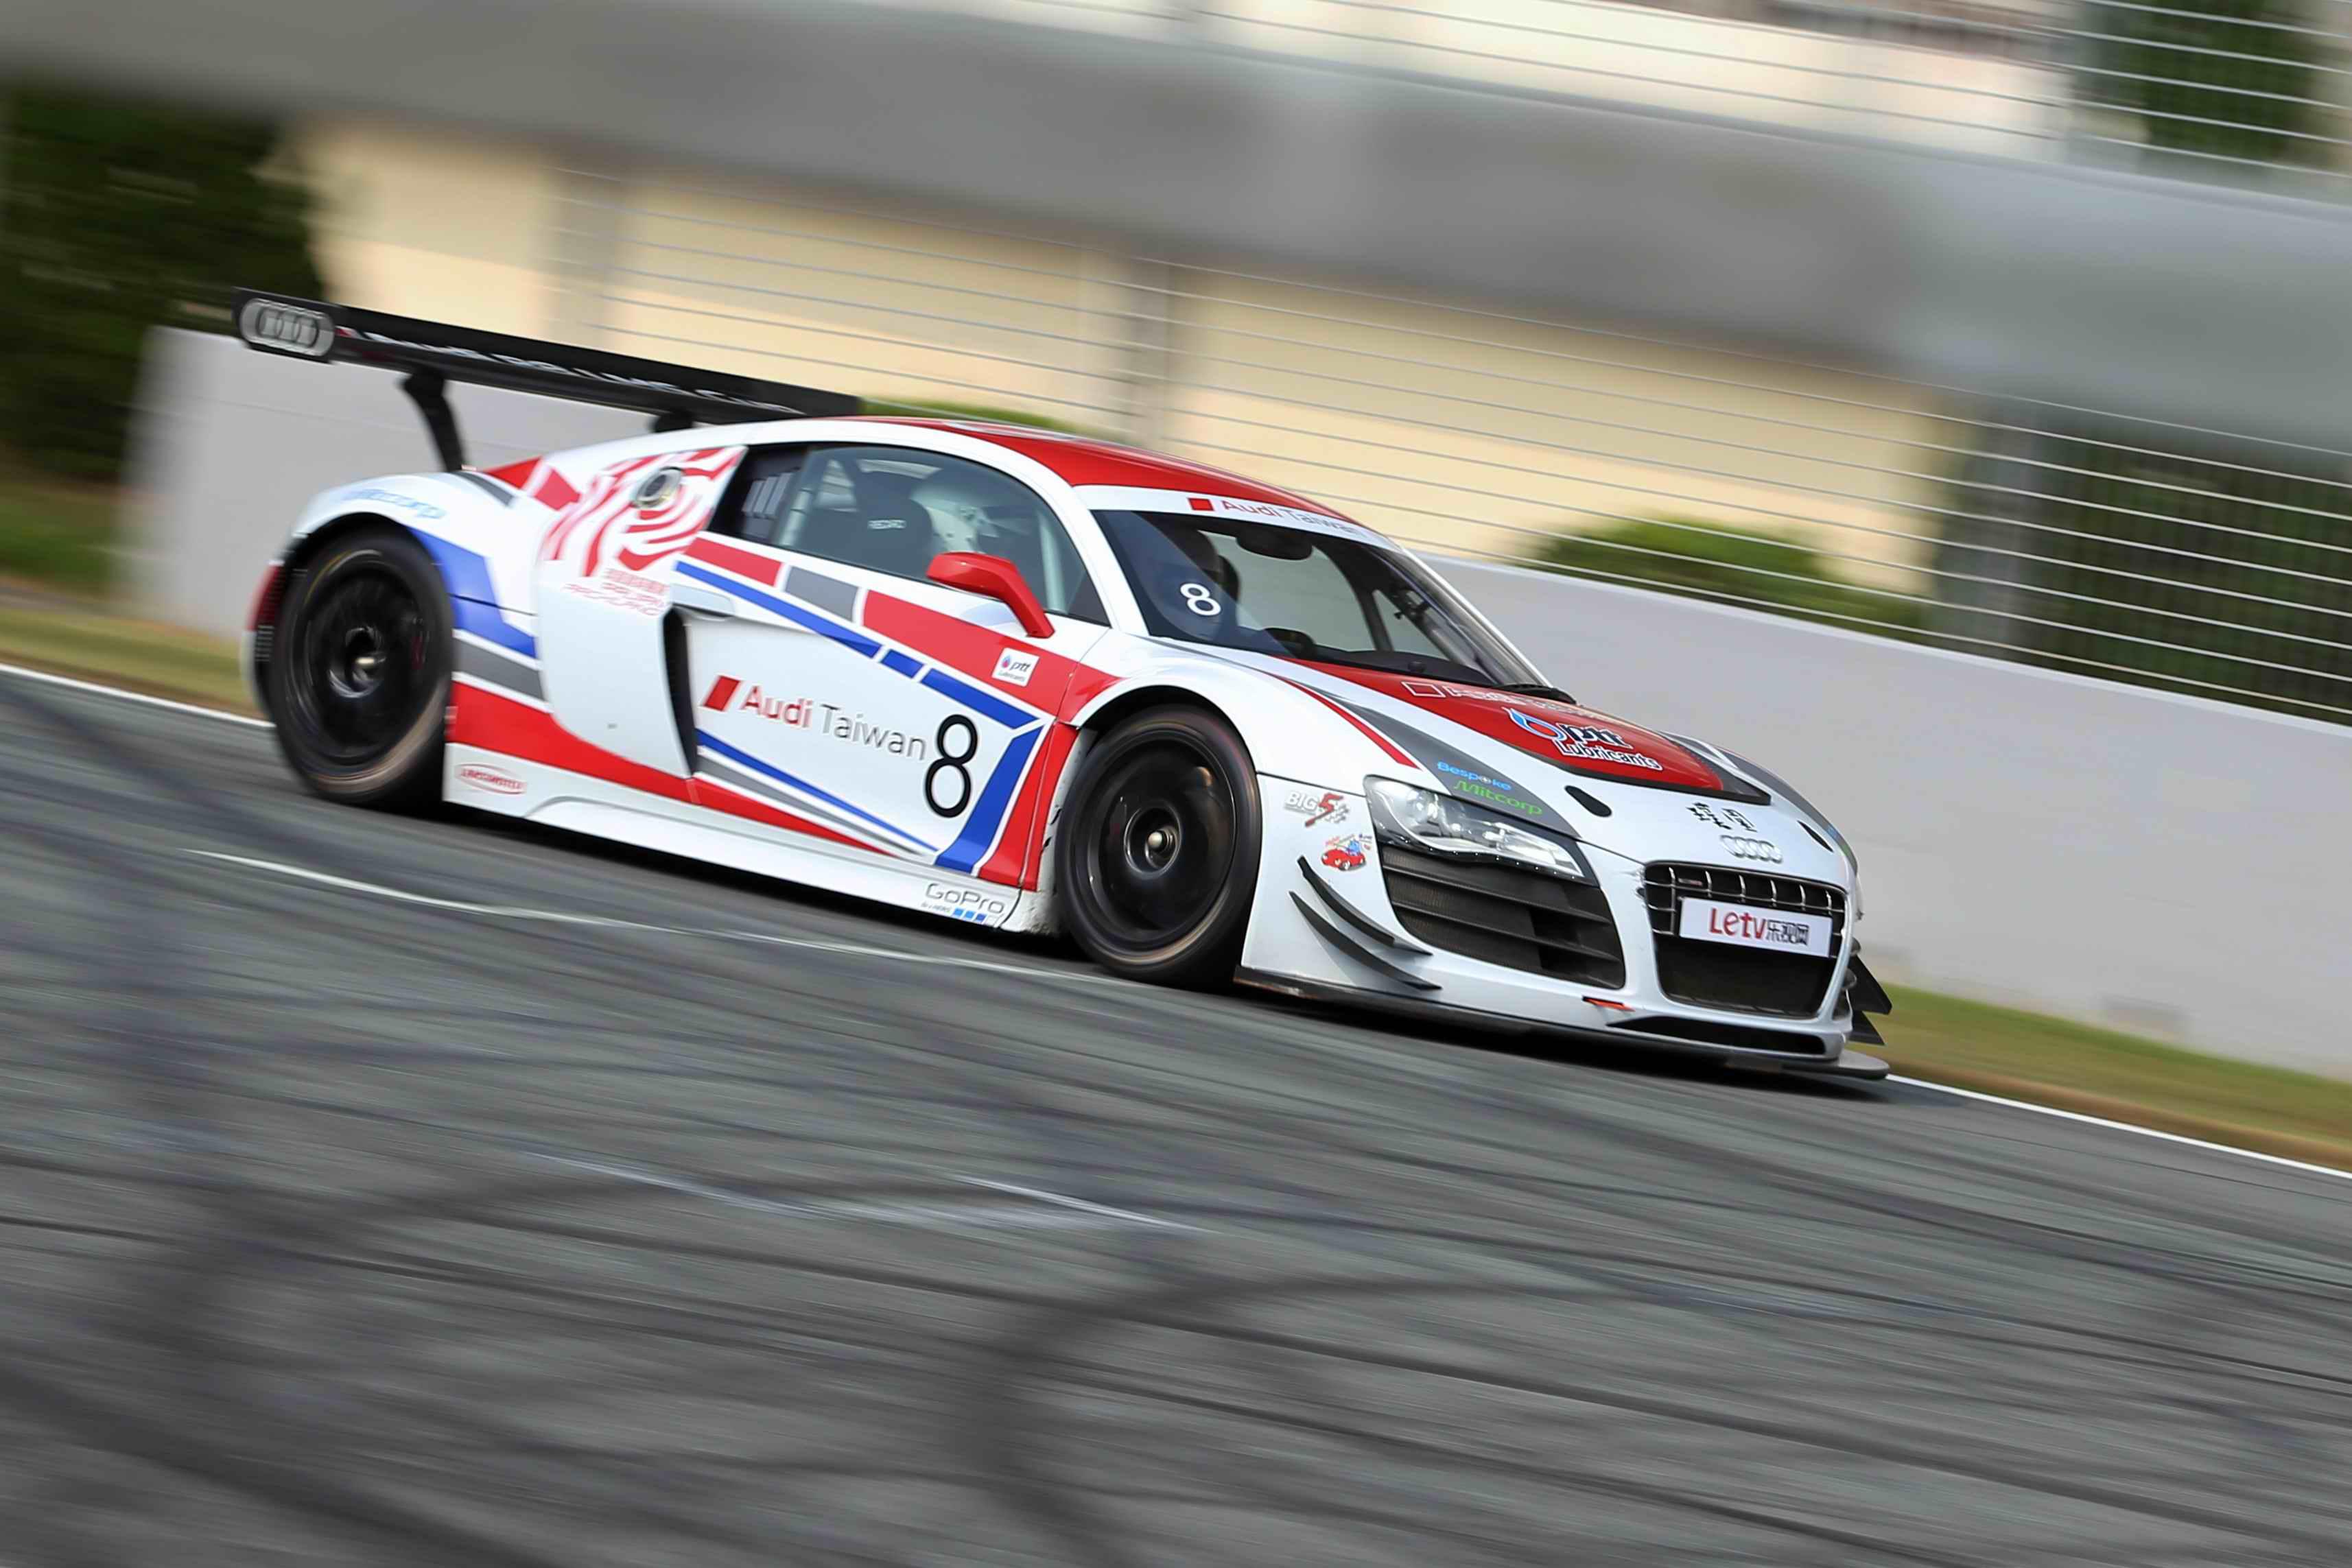 2014 Audi Driving Experience極限體驗營珠海賽道熱力狂飆!